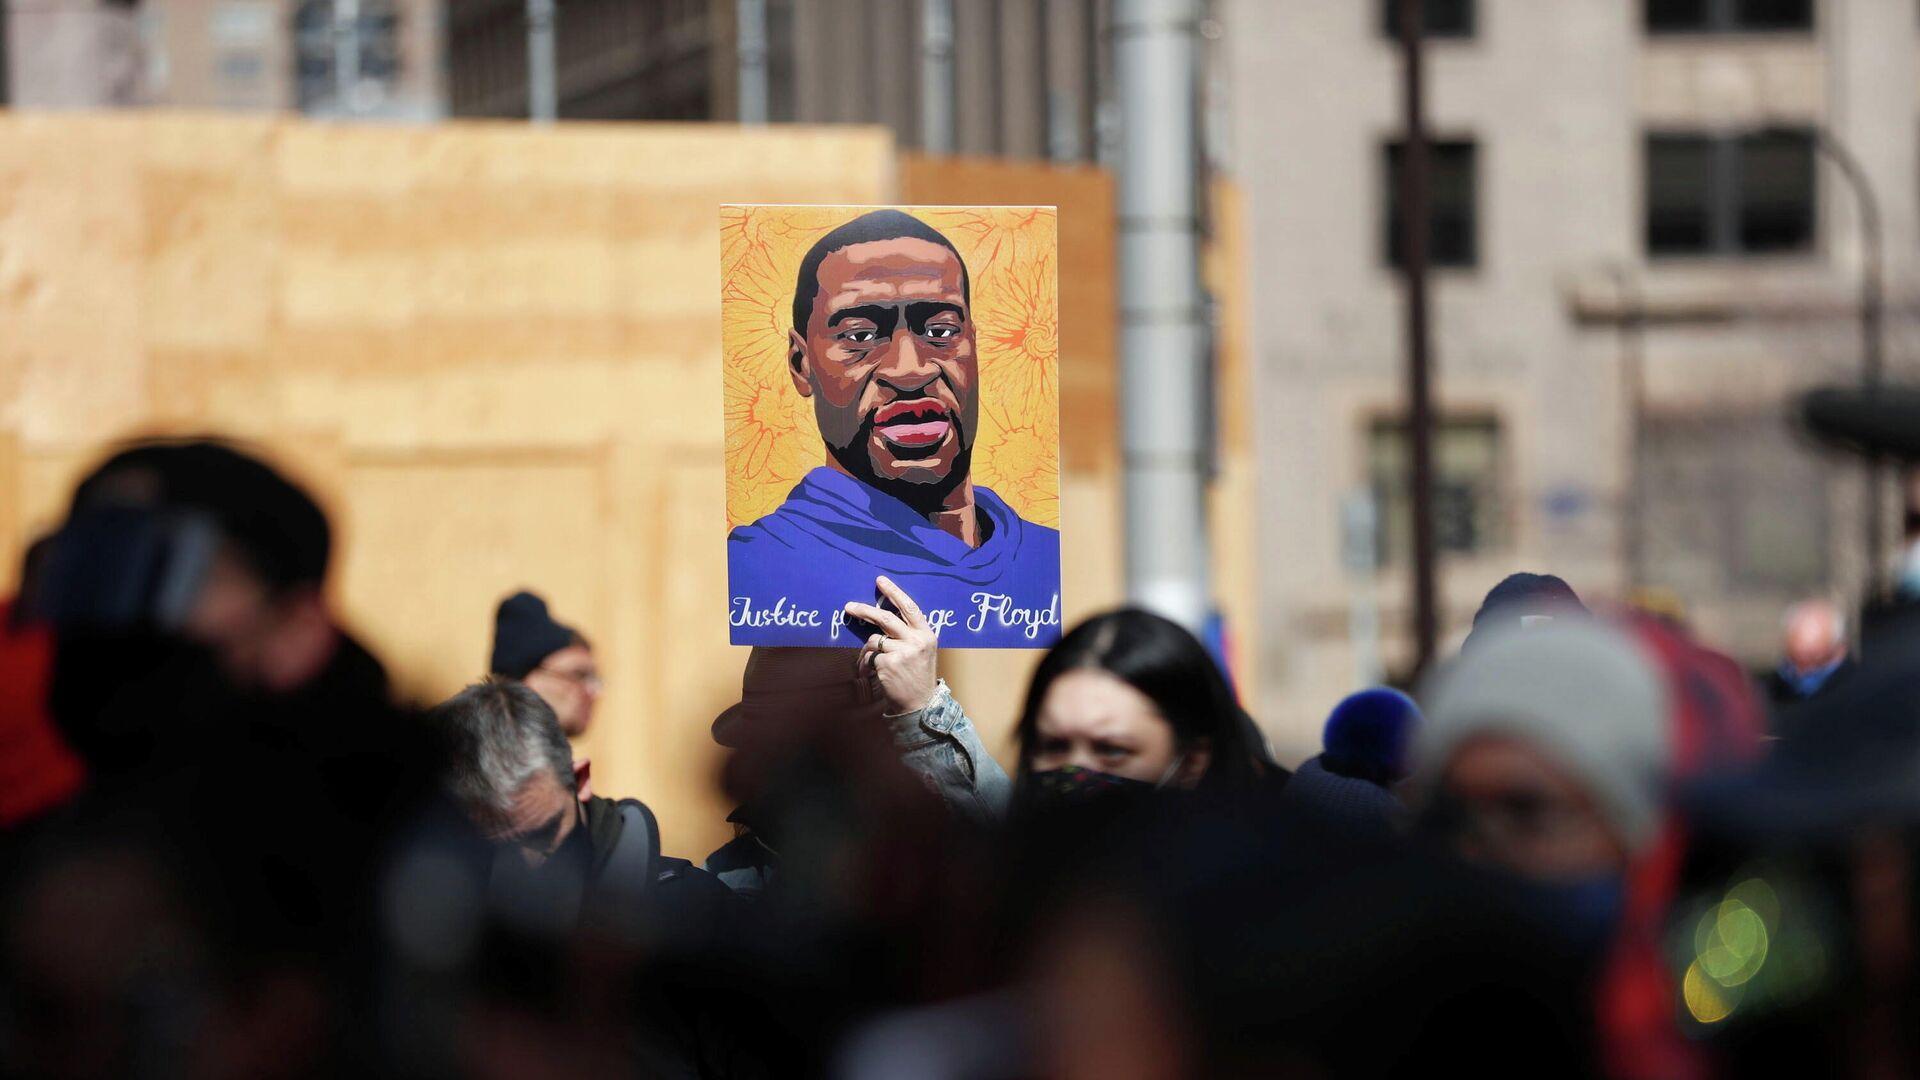 Floyd-Proteste in Minneapolis, 28. März 2021 - SNA, 1920, 19.04.2021